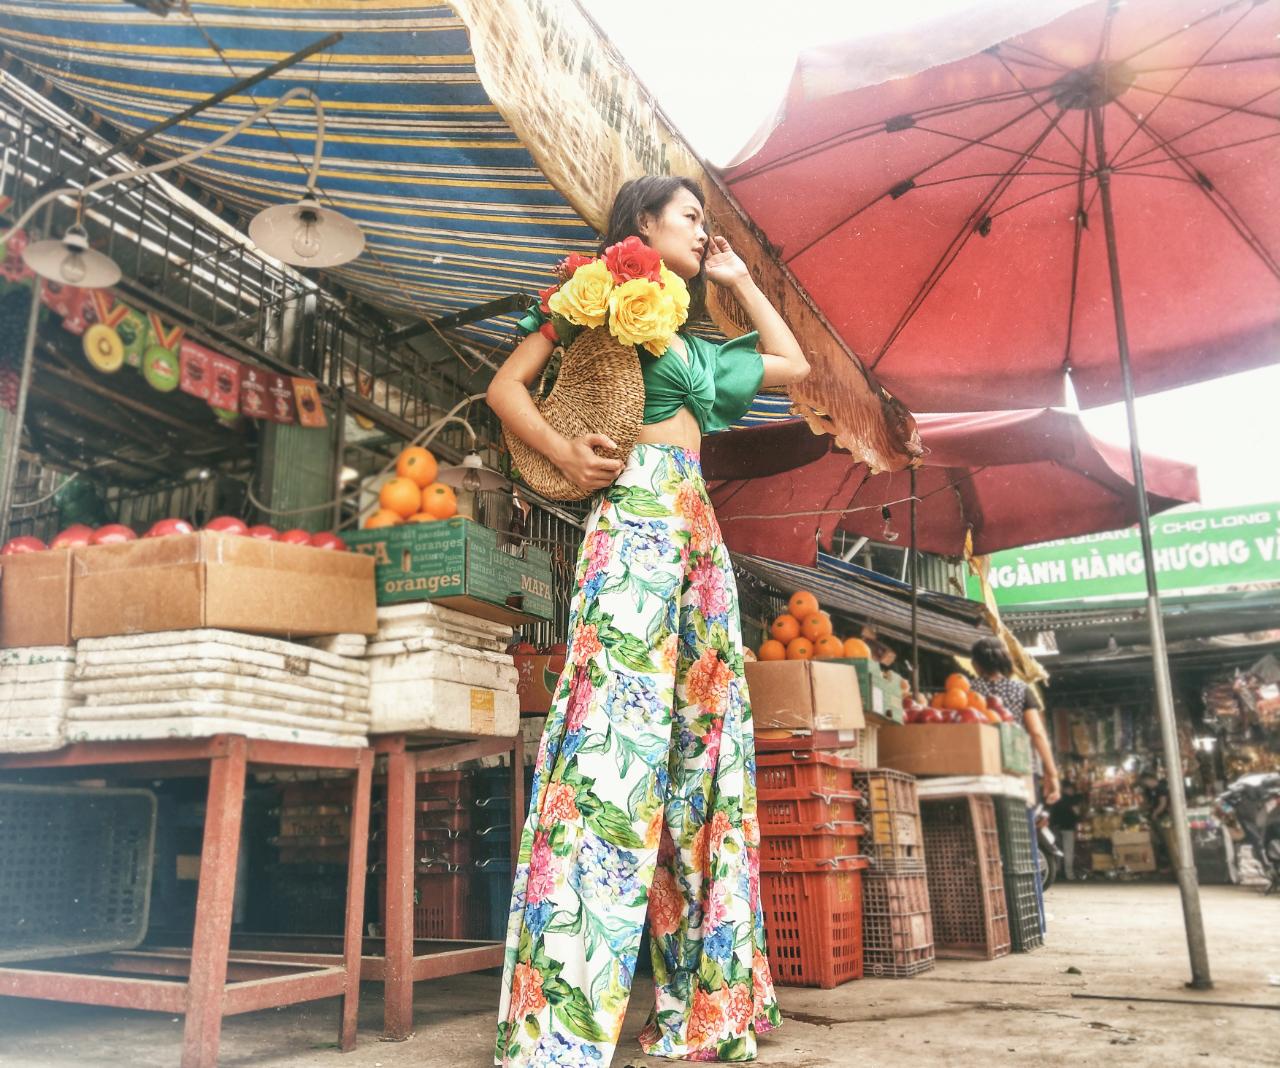 long-bien-market-vietnam-xita